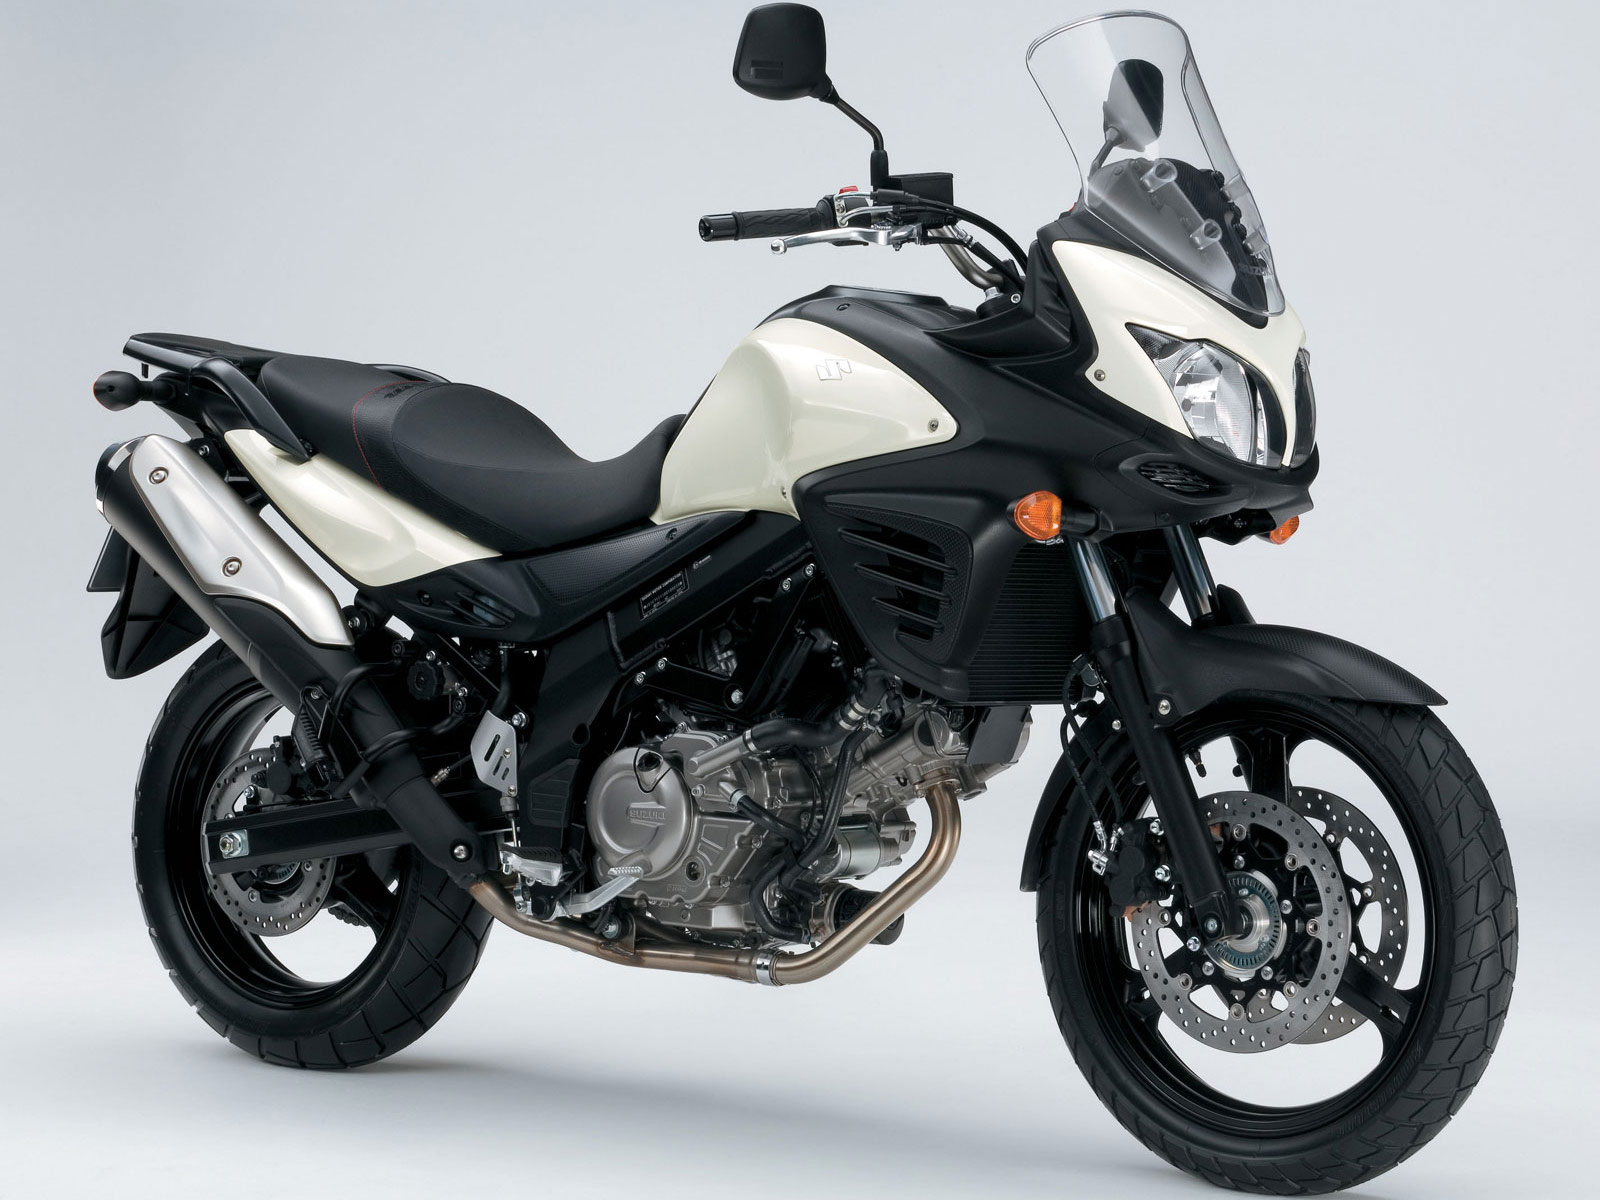 http://2.bp.blogspot.com/-2STlhrxaOCI/Tpz7ihZgANI/AAAAAAAACd8/FCYjsrSAqKo/s1600/2012-Suzuki-VStrom-650-ABS_motorcycle-desktop-wallpaper_5.jpg